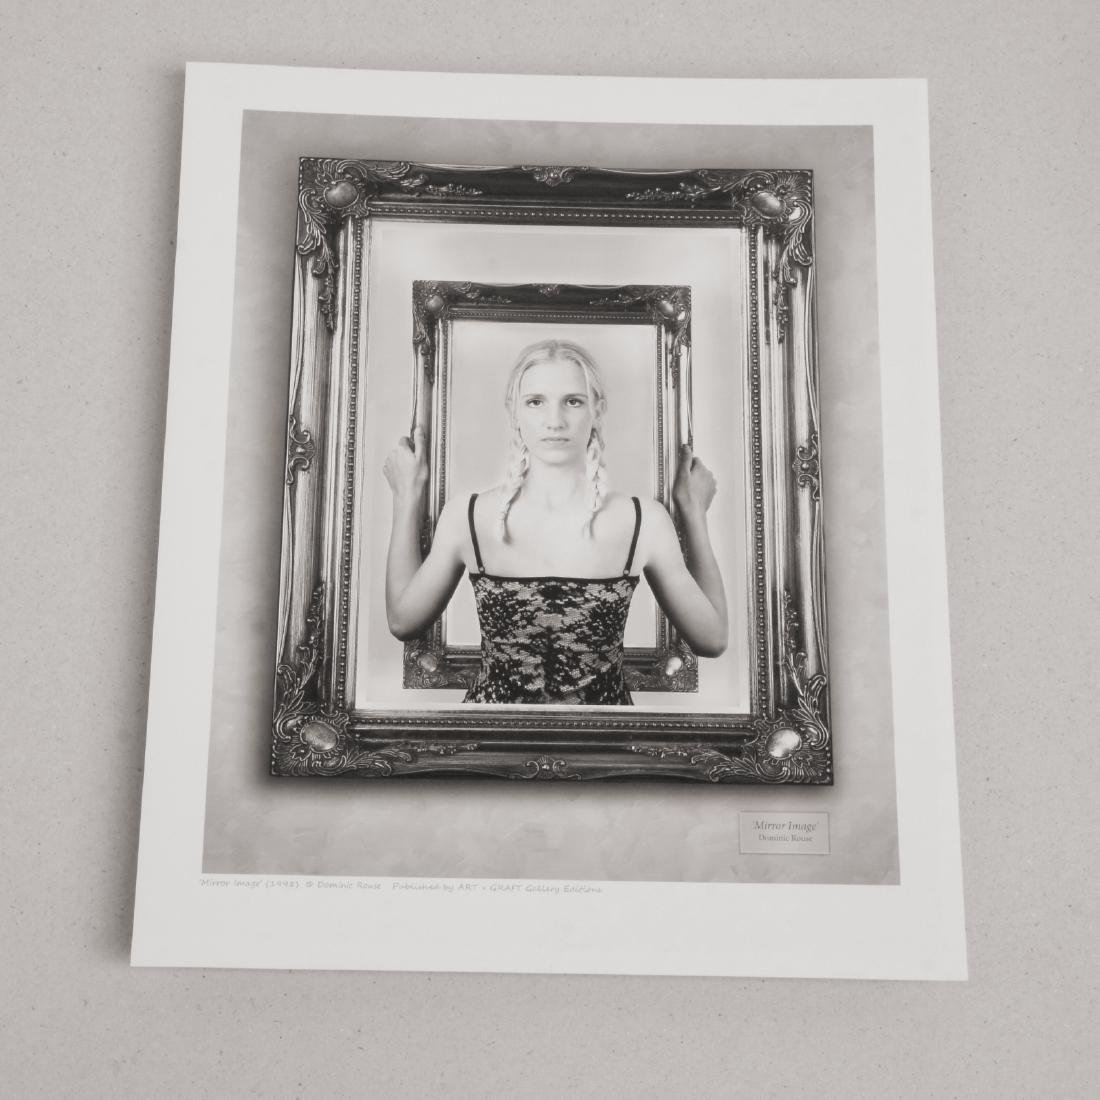 Dominic Rouse Mirror Image Print - 2